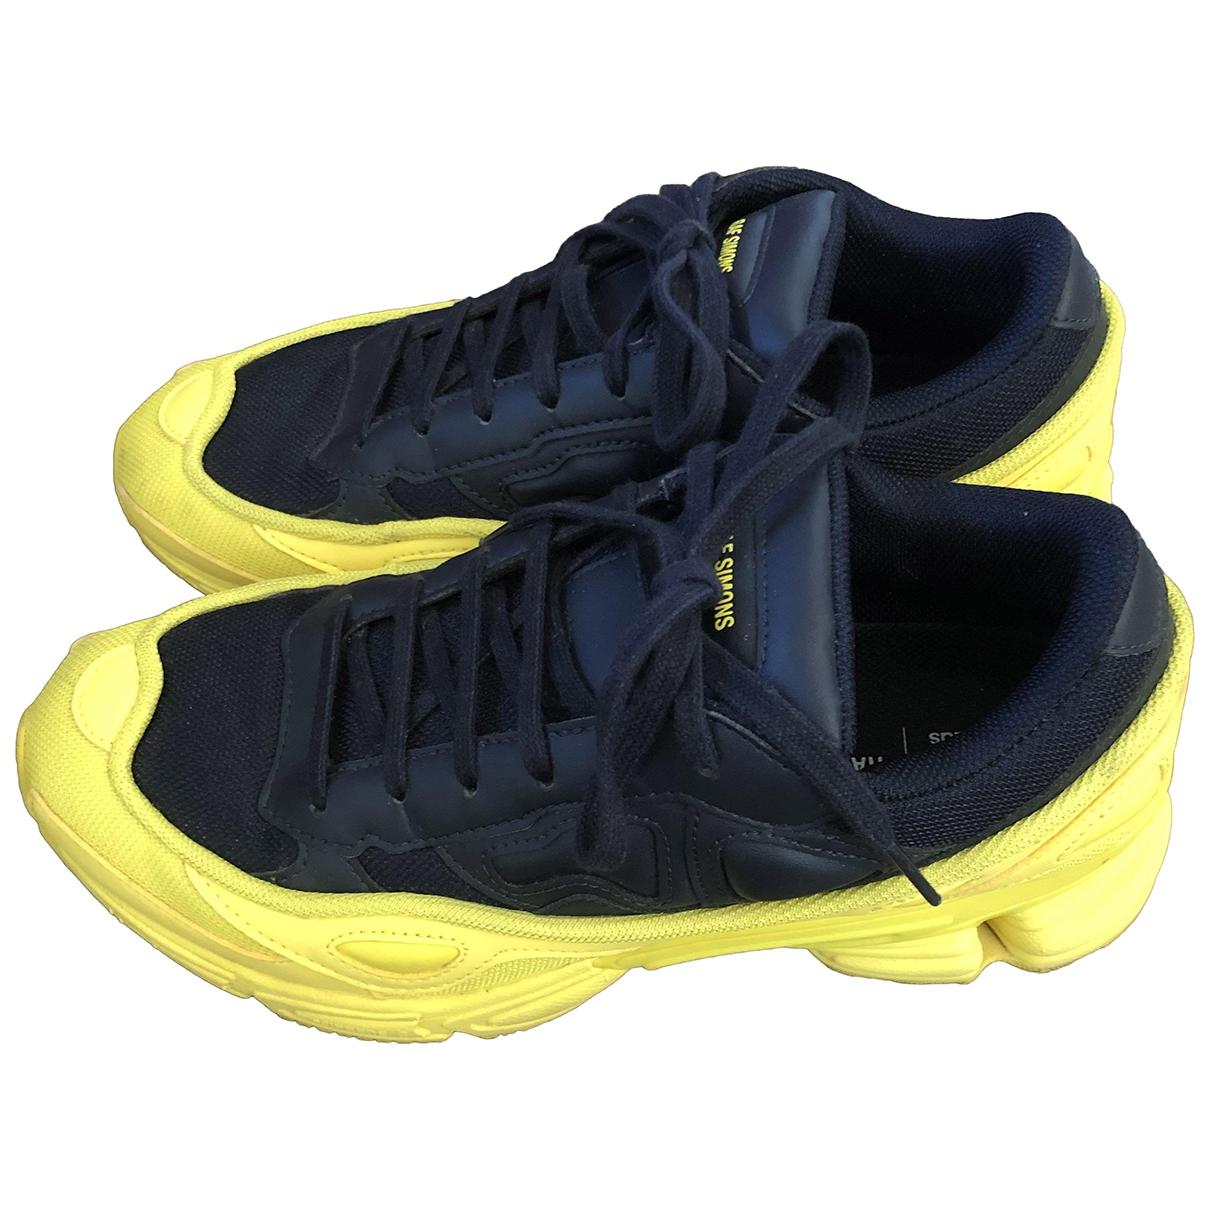 Adidas X Raf Simons - Baskets Ozweego 2 pour femme